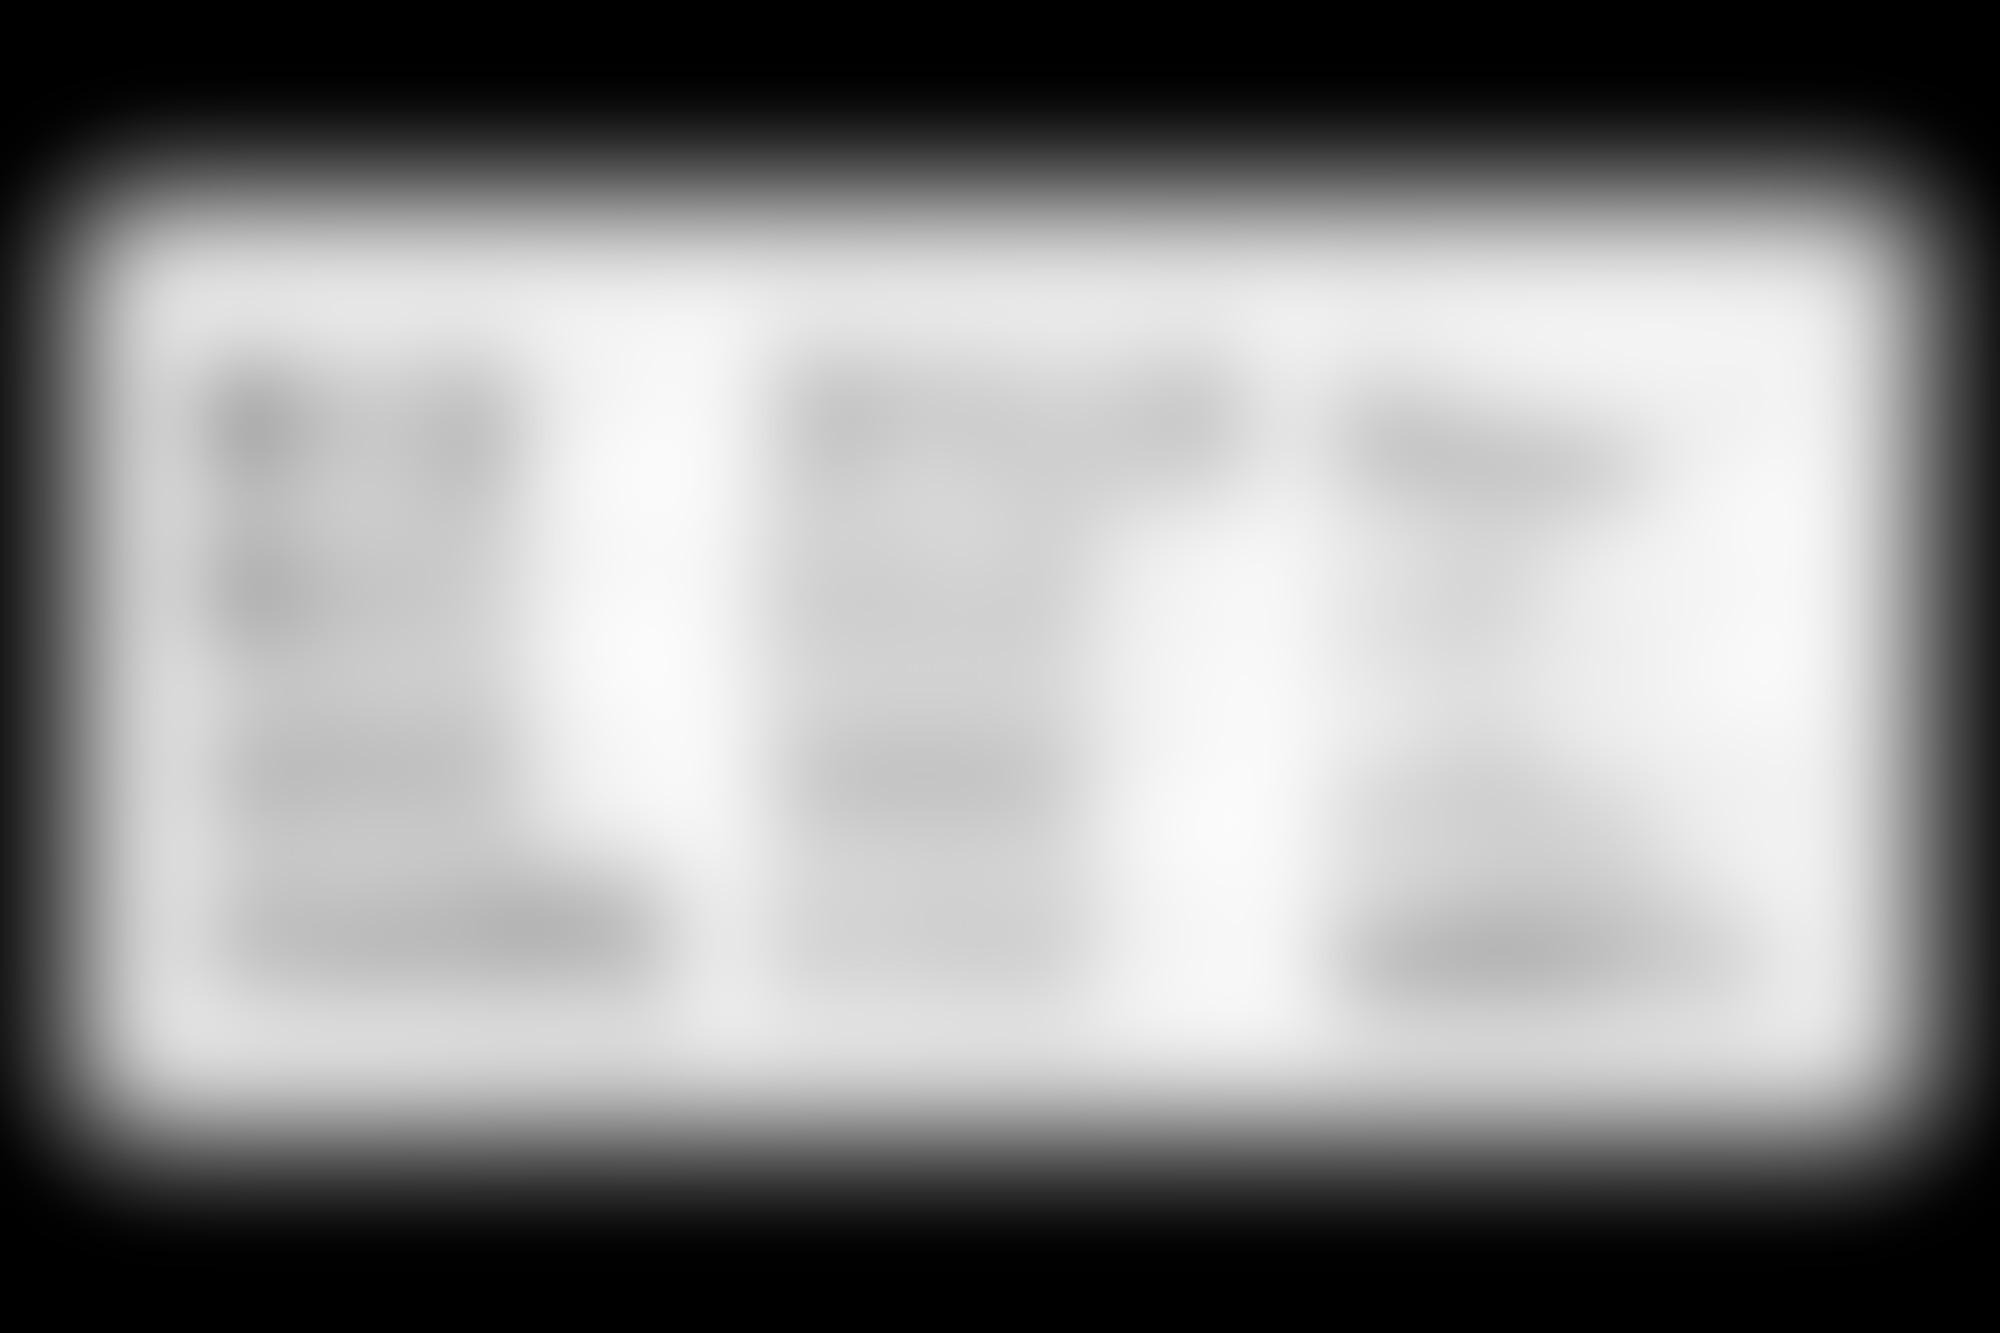 Neil Macguire Lecture in progress mama mia autocompressfitresizeixlibphp 1 1 0max h2000max w3 D2000q80s150d98a614315de5ccb6113fdd6cfd8c